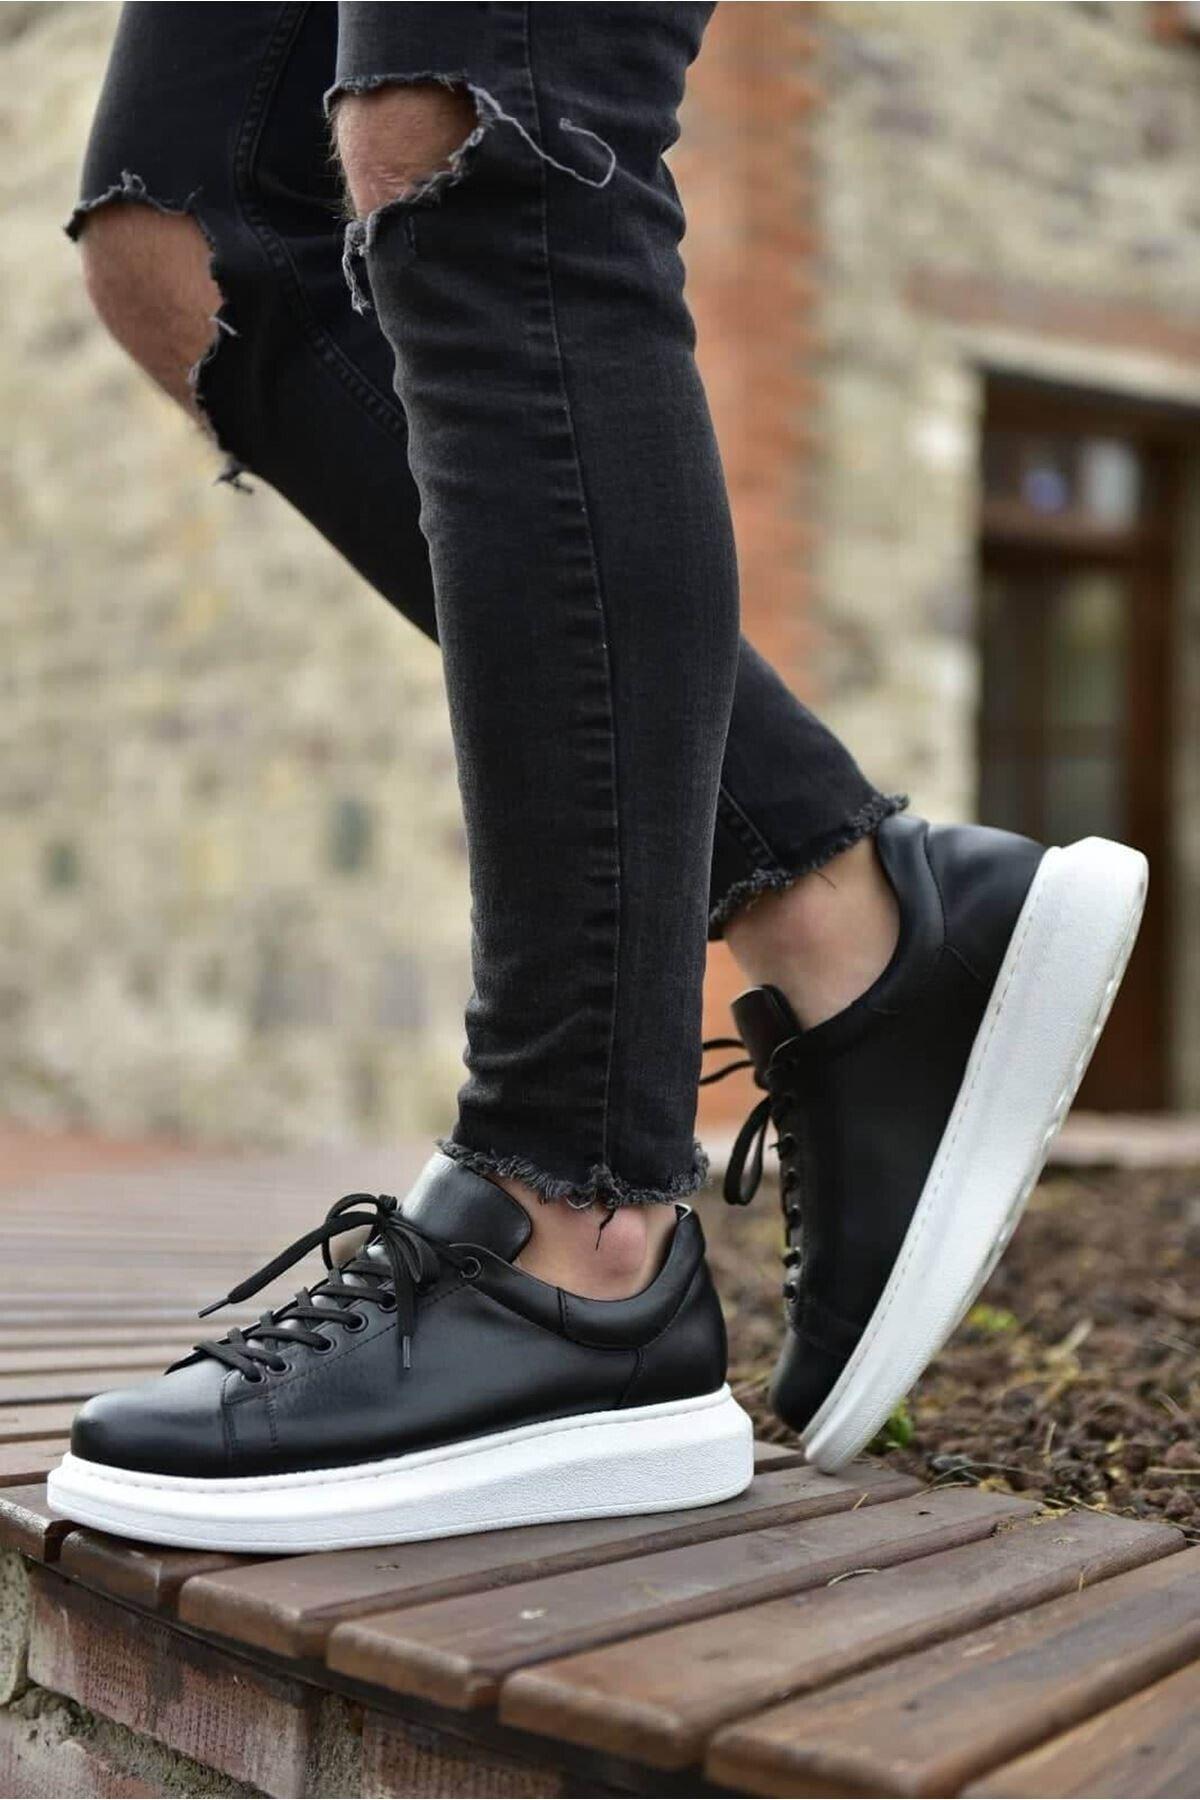 Chekich Ch257 Bt Erkek Ayakkabı Sıyah 1